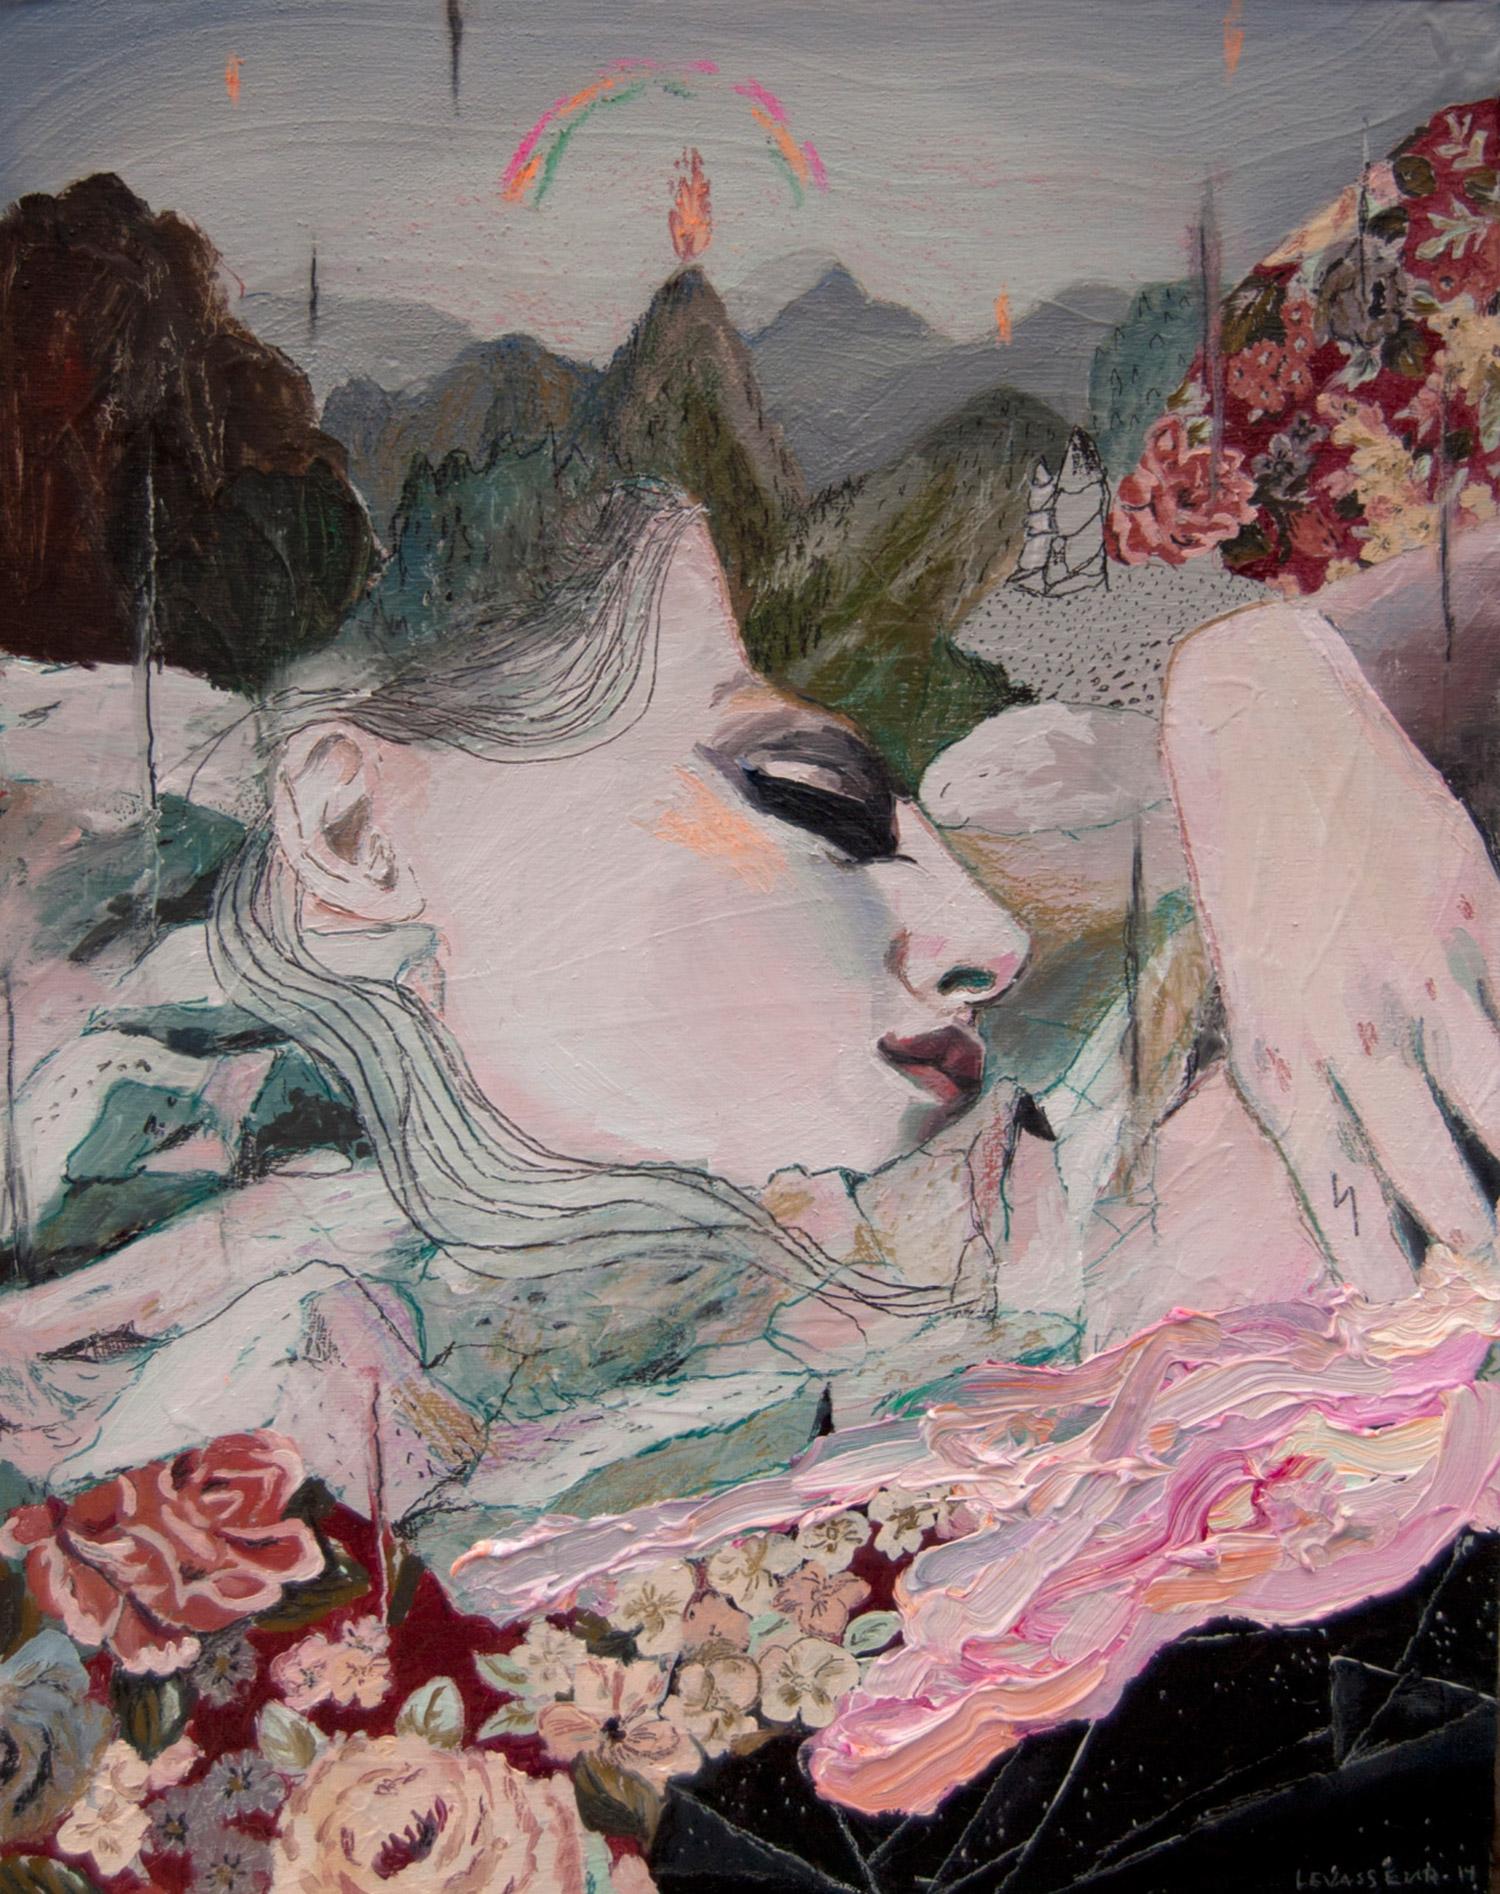 Alexandra Levasseur - Amorphous Landscape II